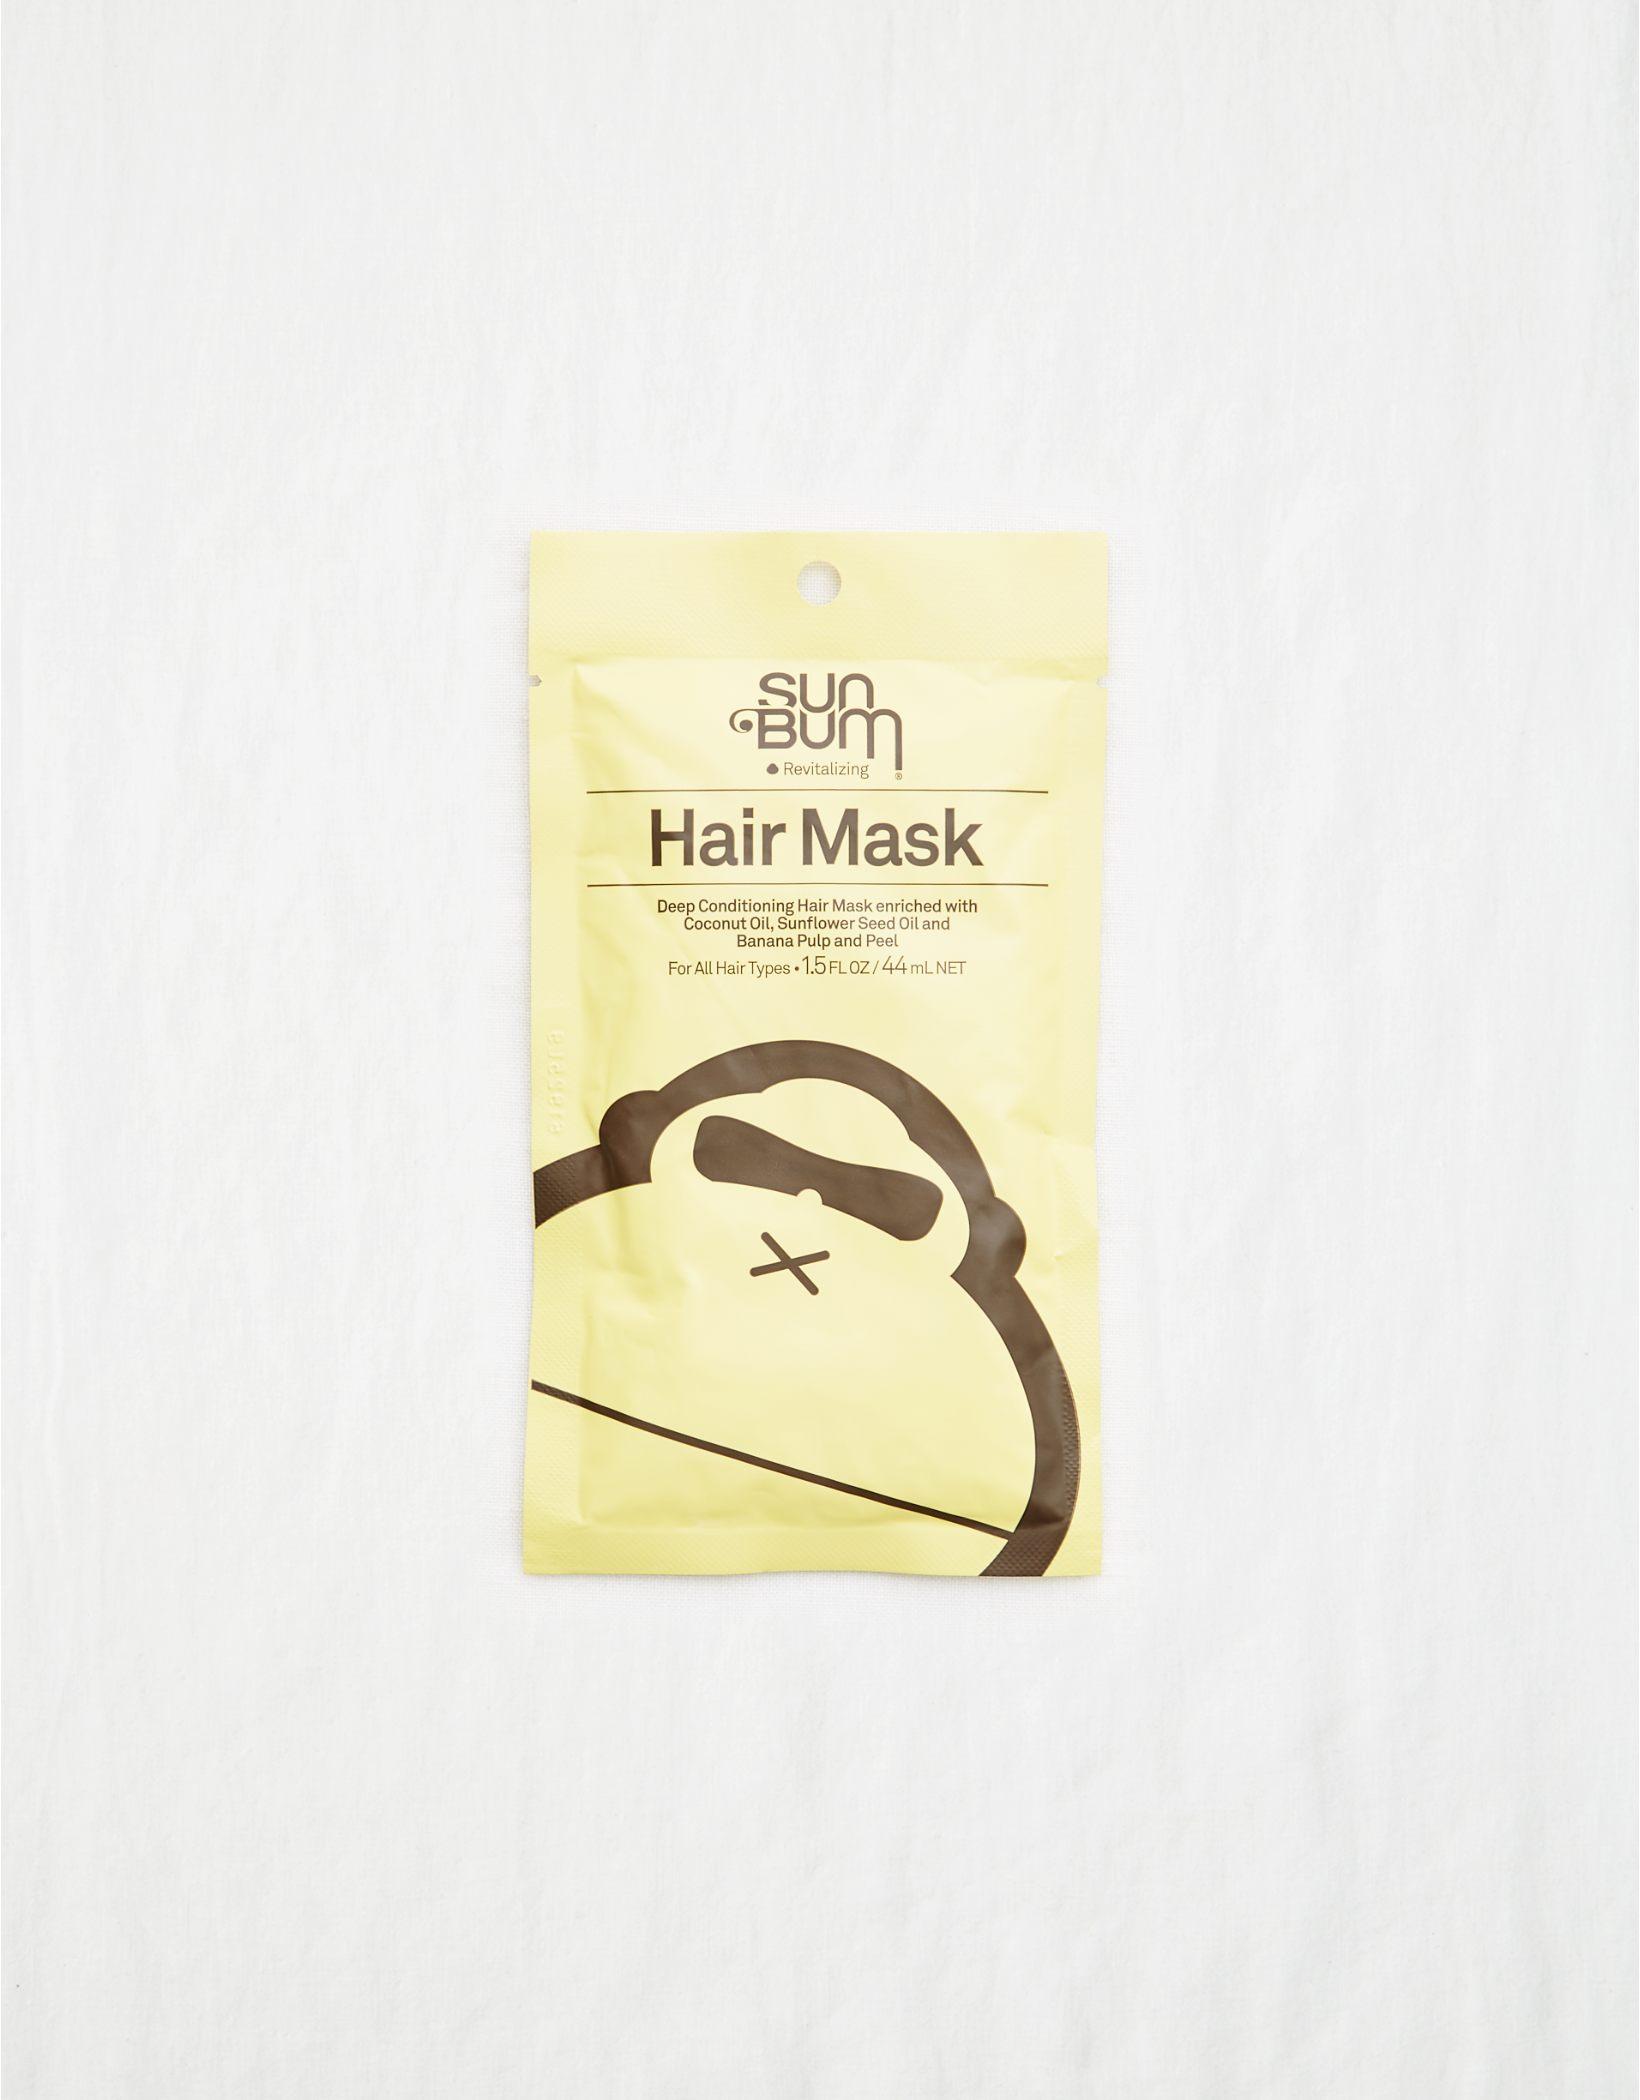 Sun Bum Revitalizing Hair Mask